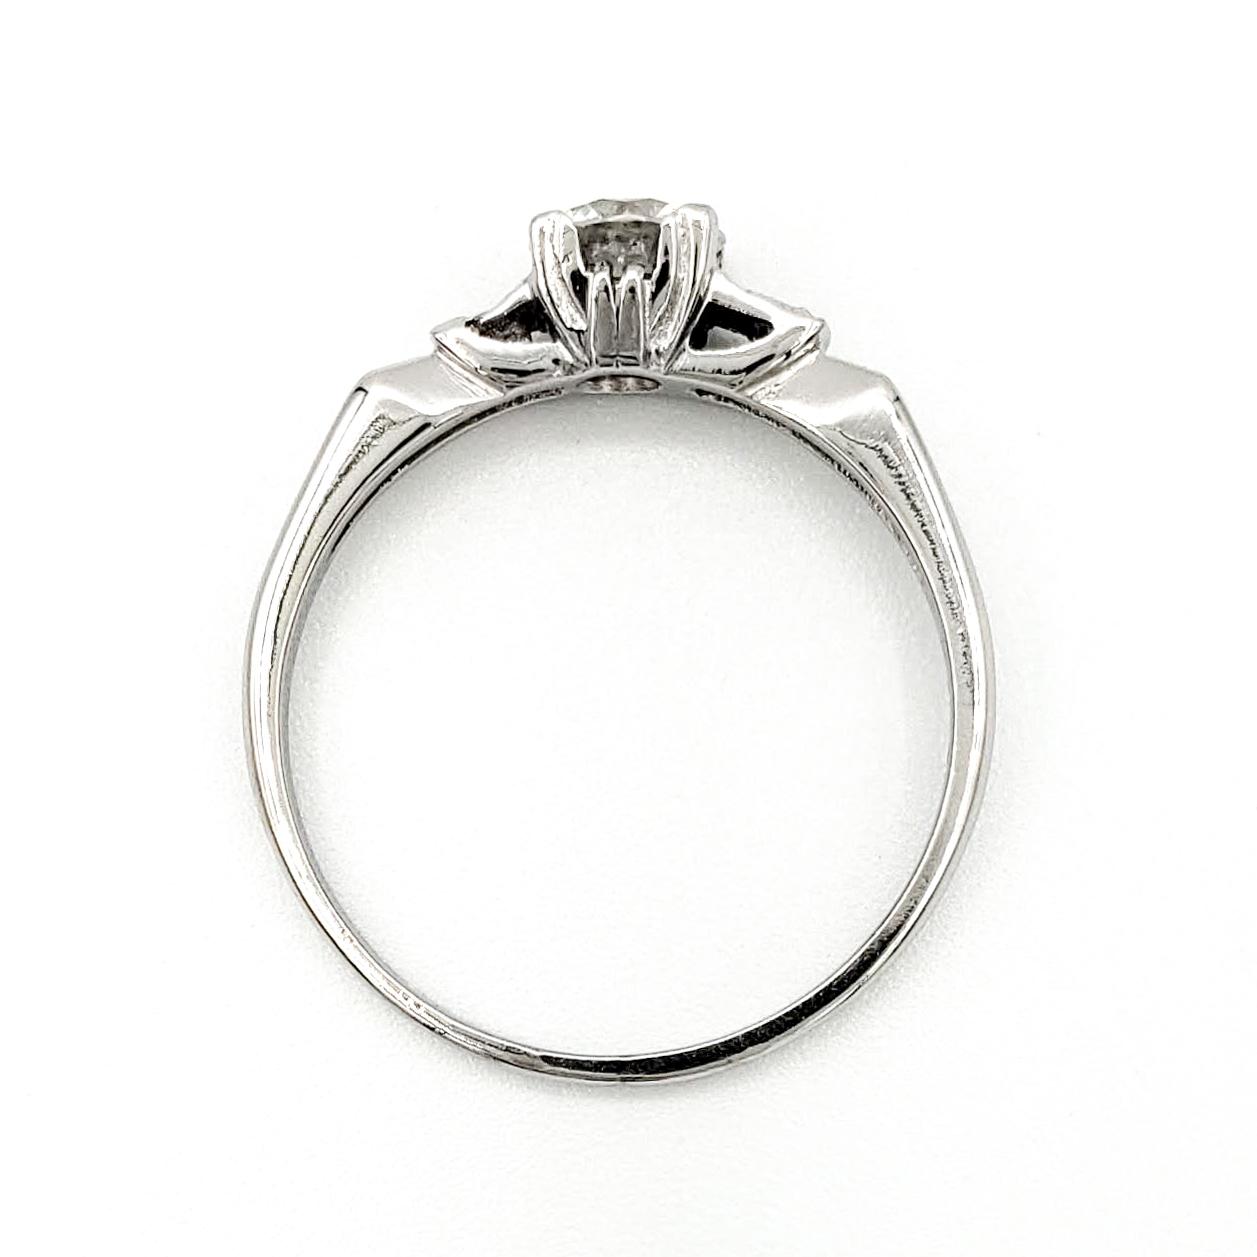 vintage-platinum-engagement-ring-with-0-50-carat-round-brilliant-cut-diamond-egl-d-si2